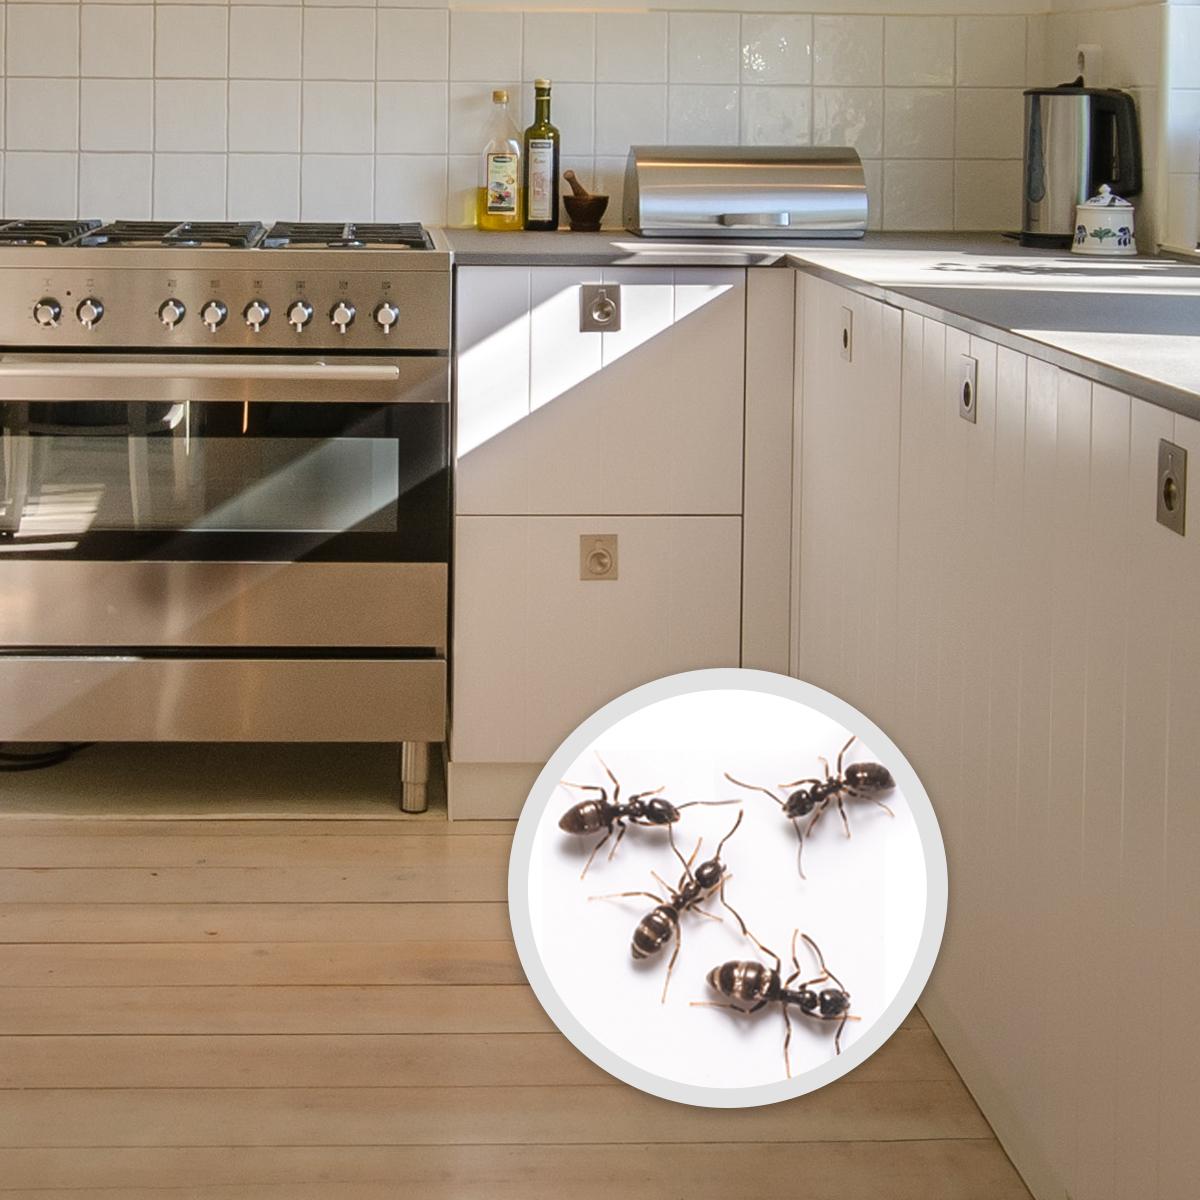 Wil-Kil Pest Control